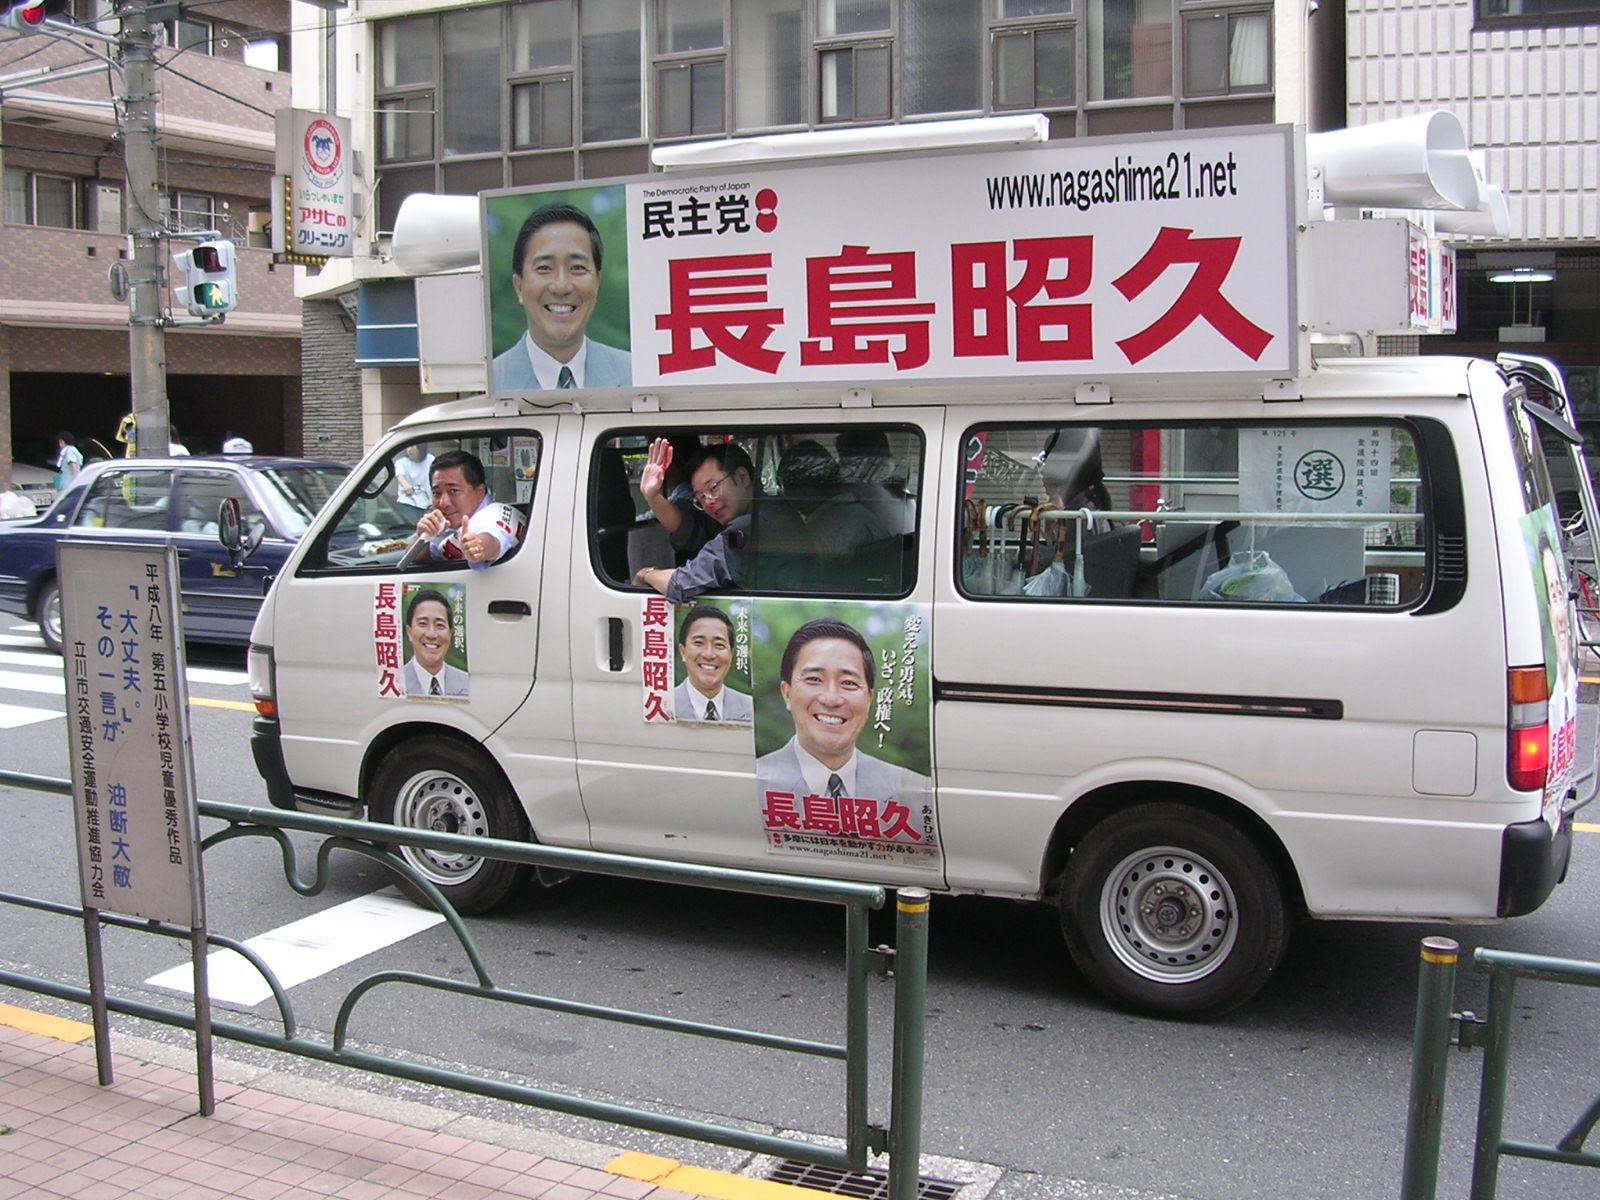 Файл:Japan election 2005 dpj bus.jpg